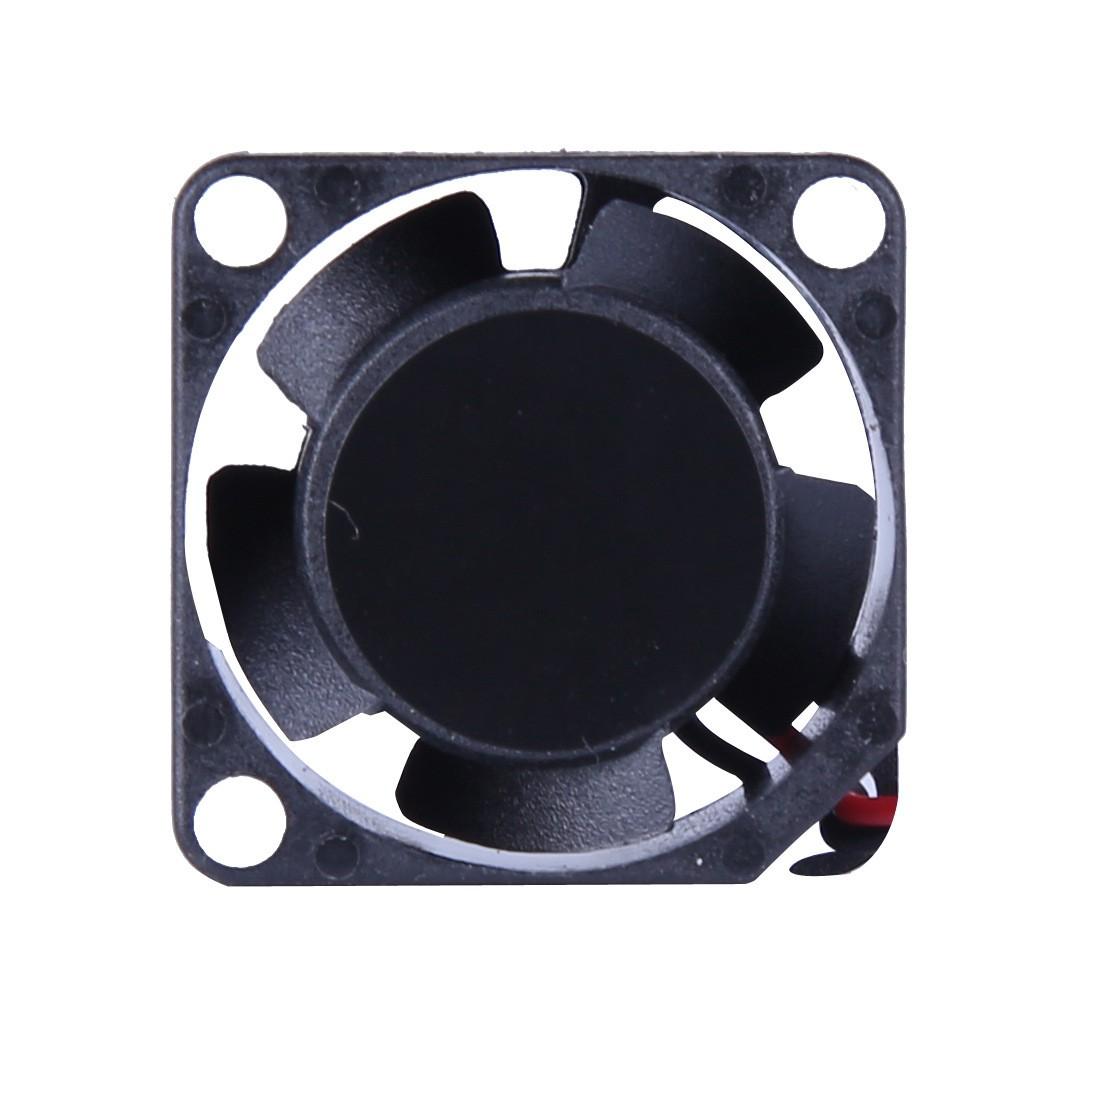 SUNON GM0501PFV1-8 DC 5V 1.1W small cooling fan